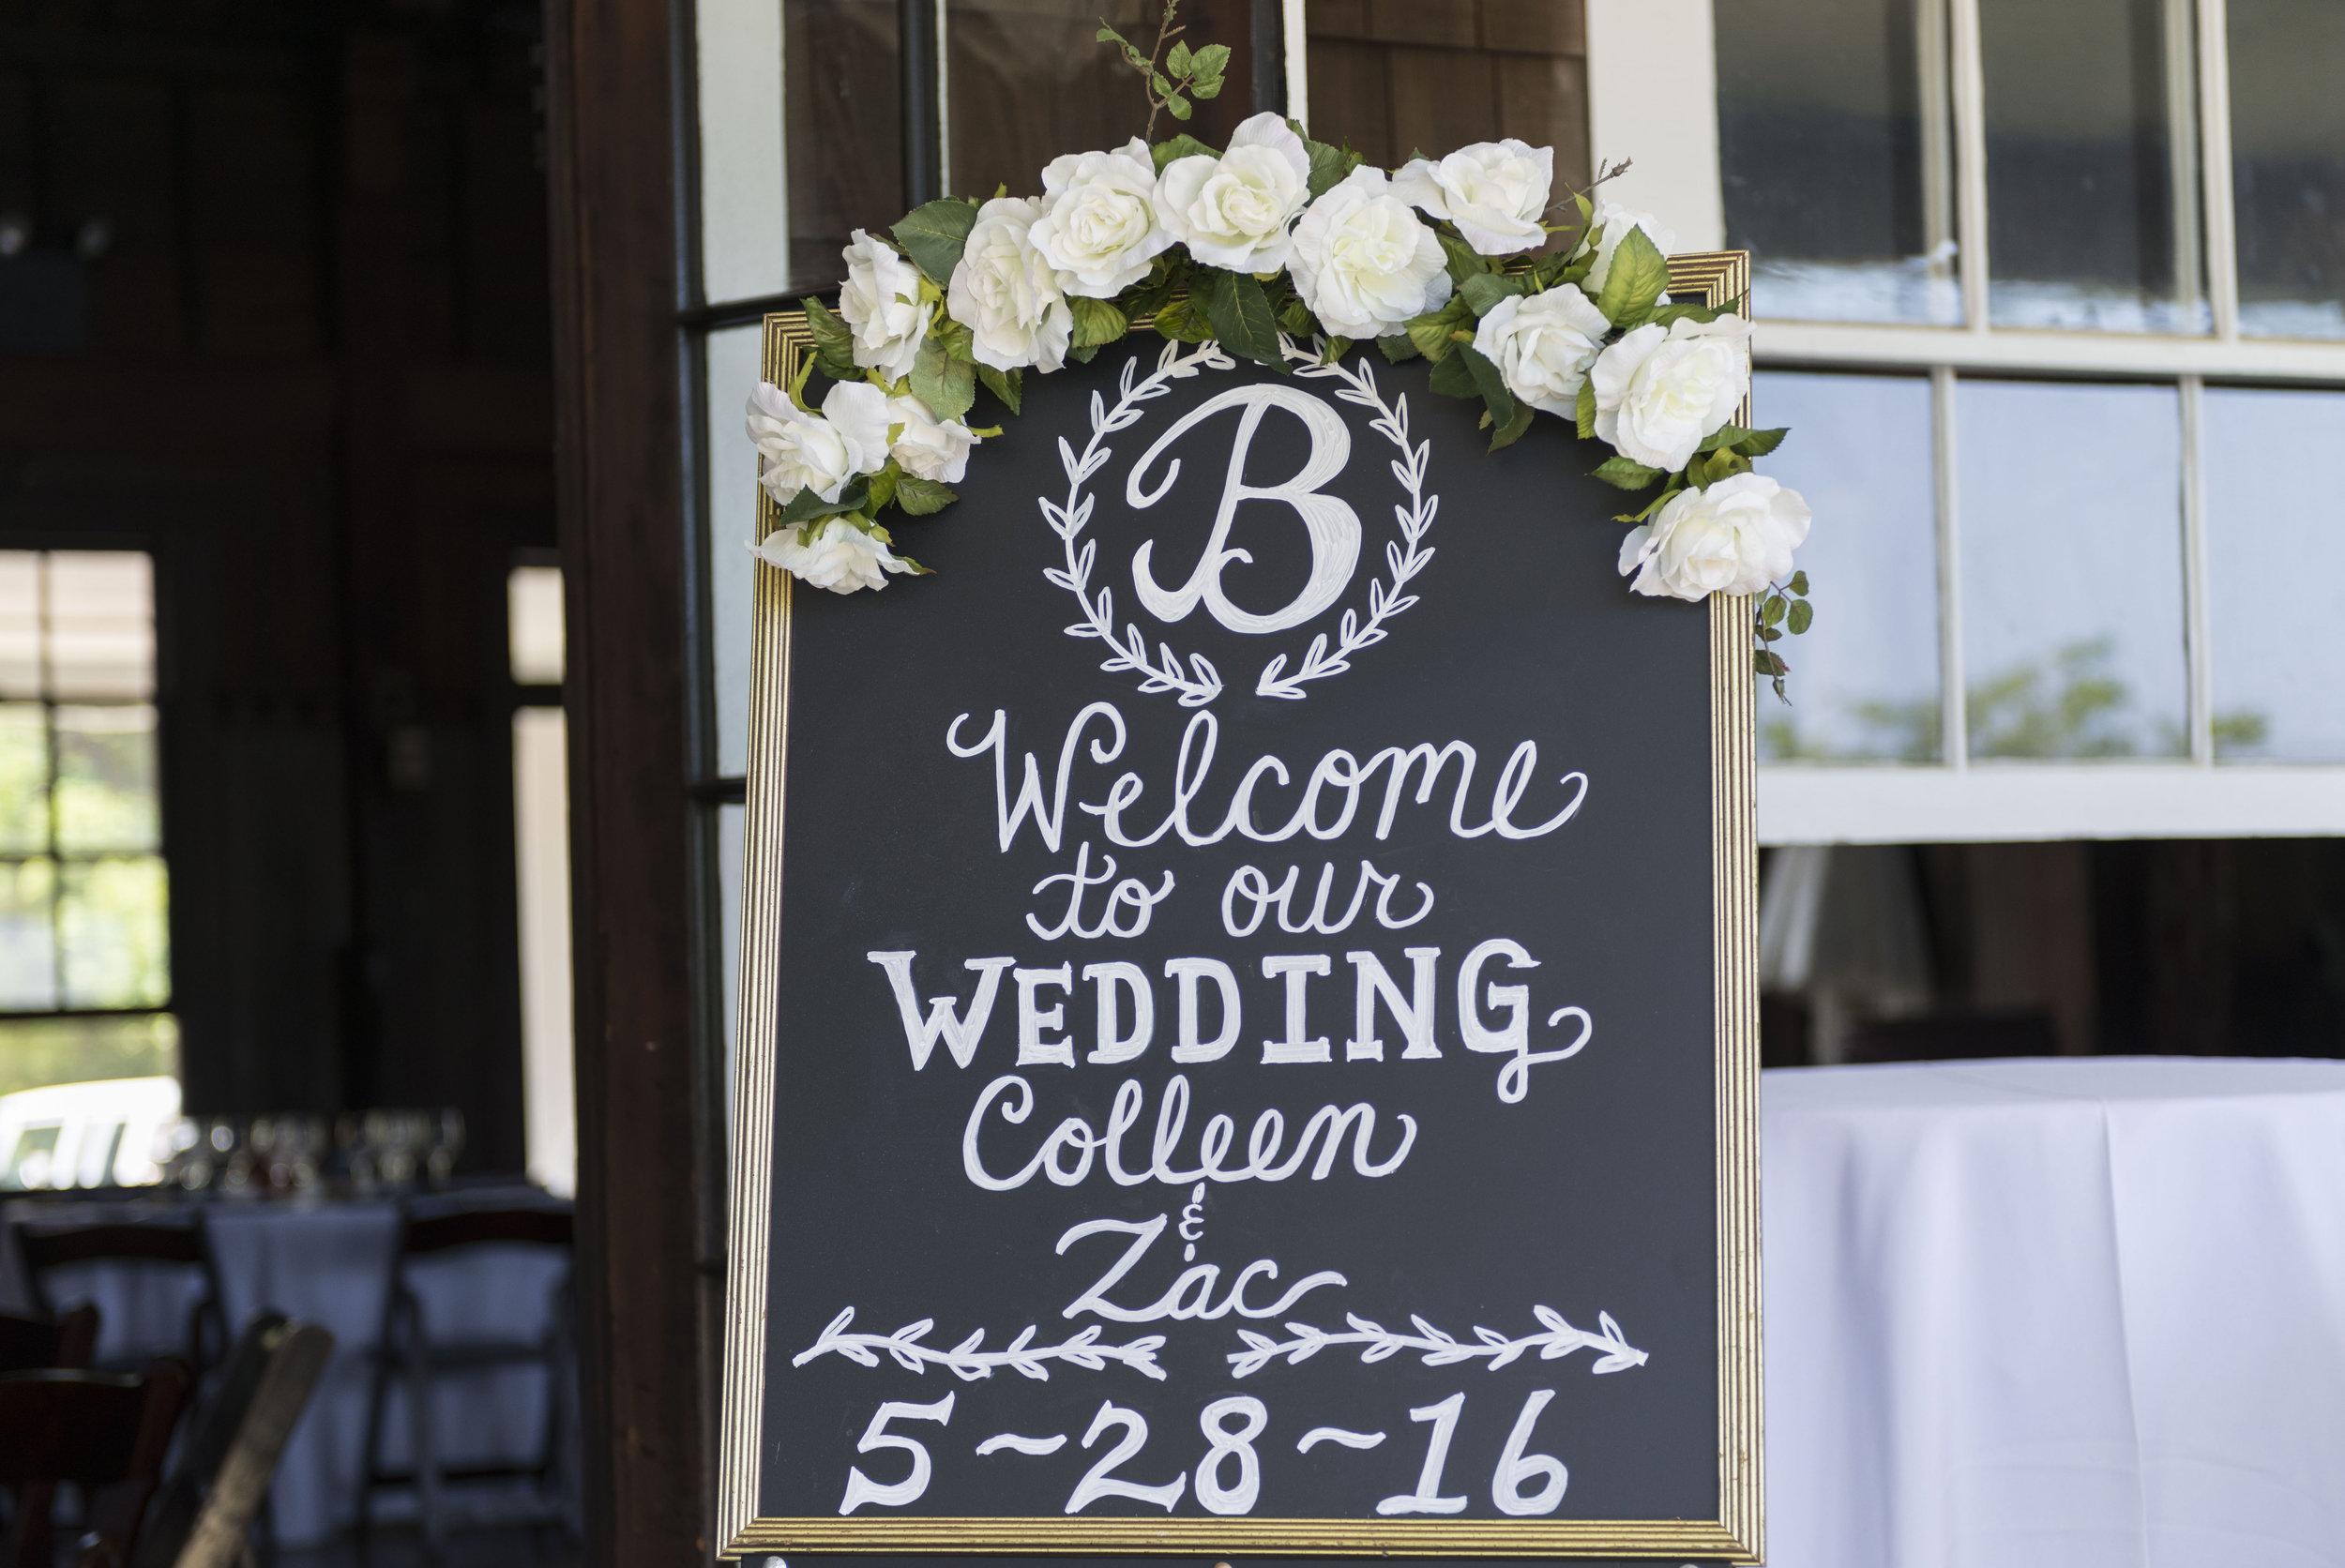 20160528 Colleen+Zac Wedding 0045.jpg